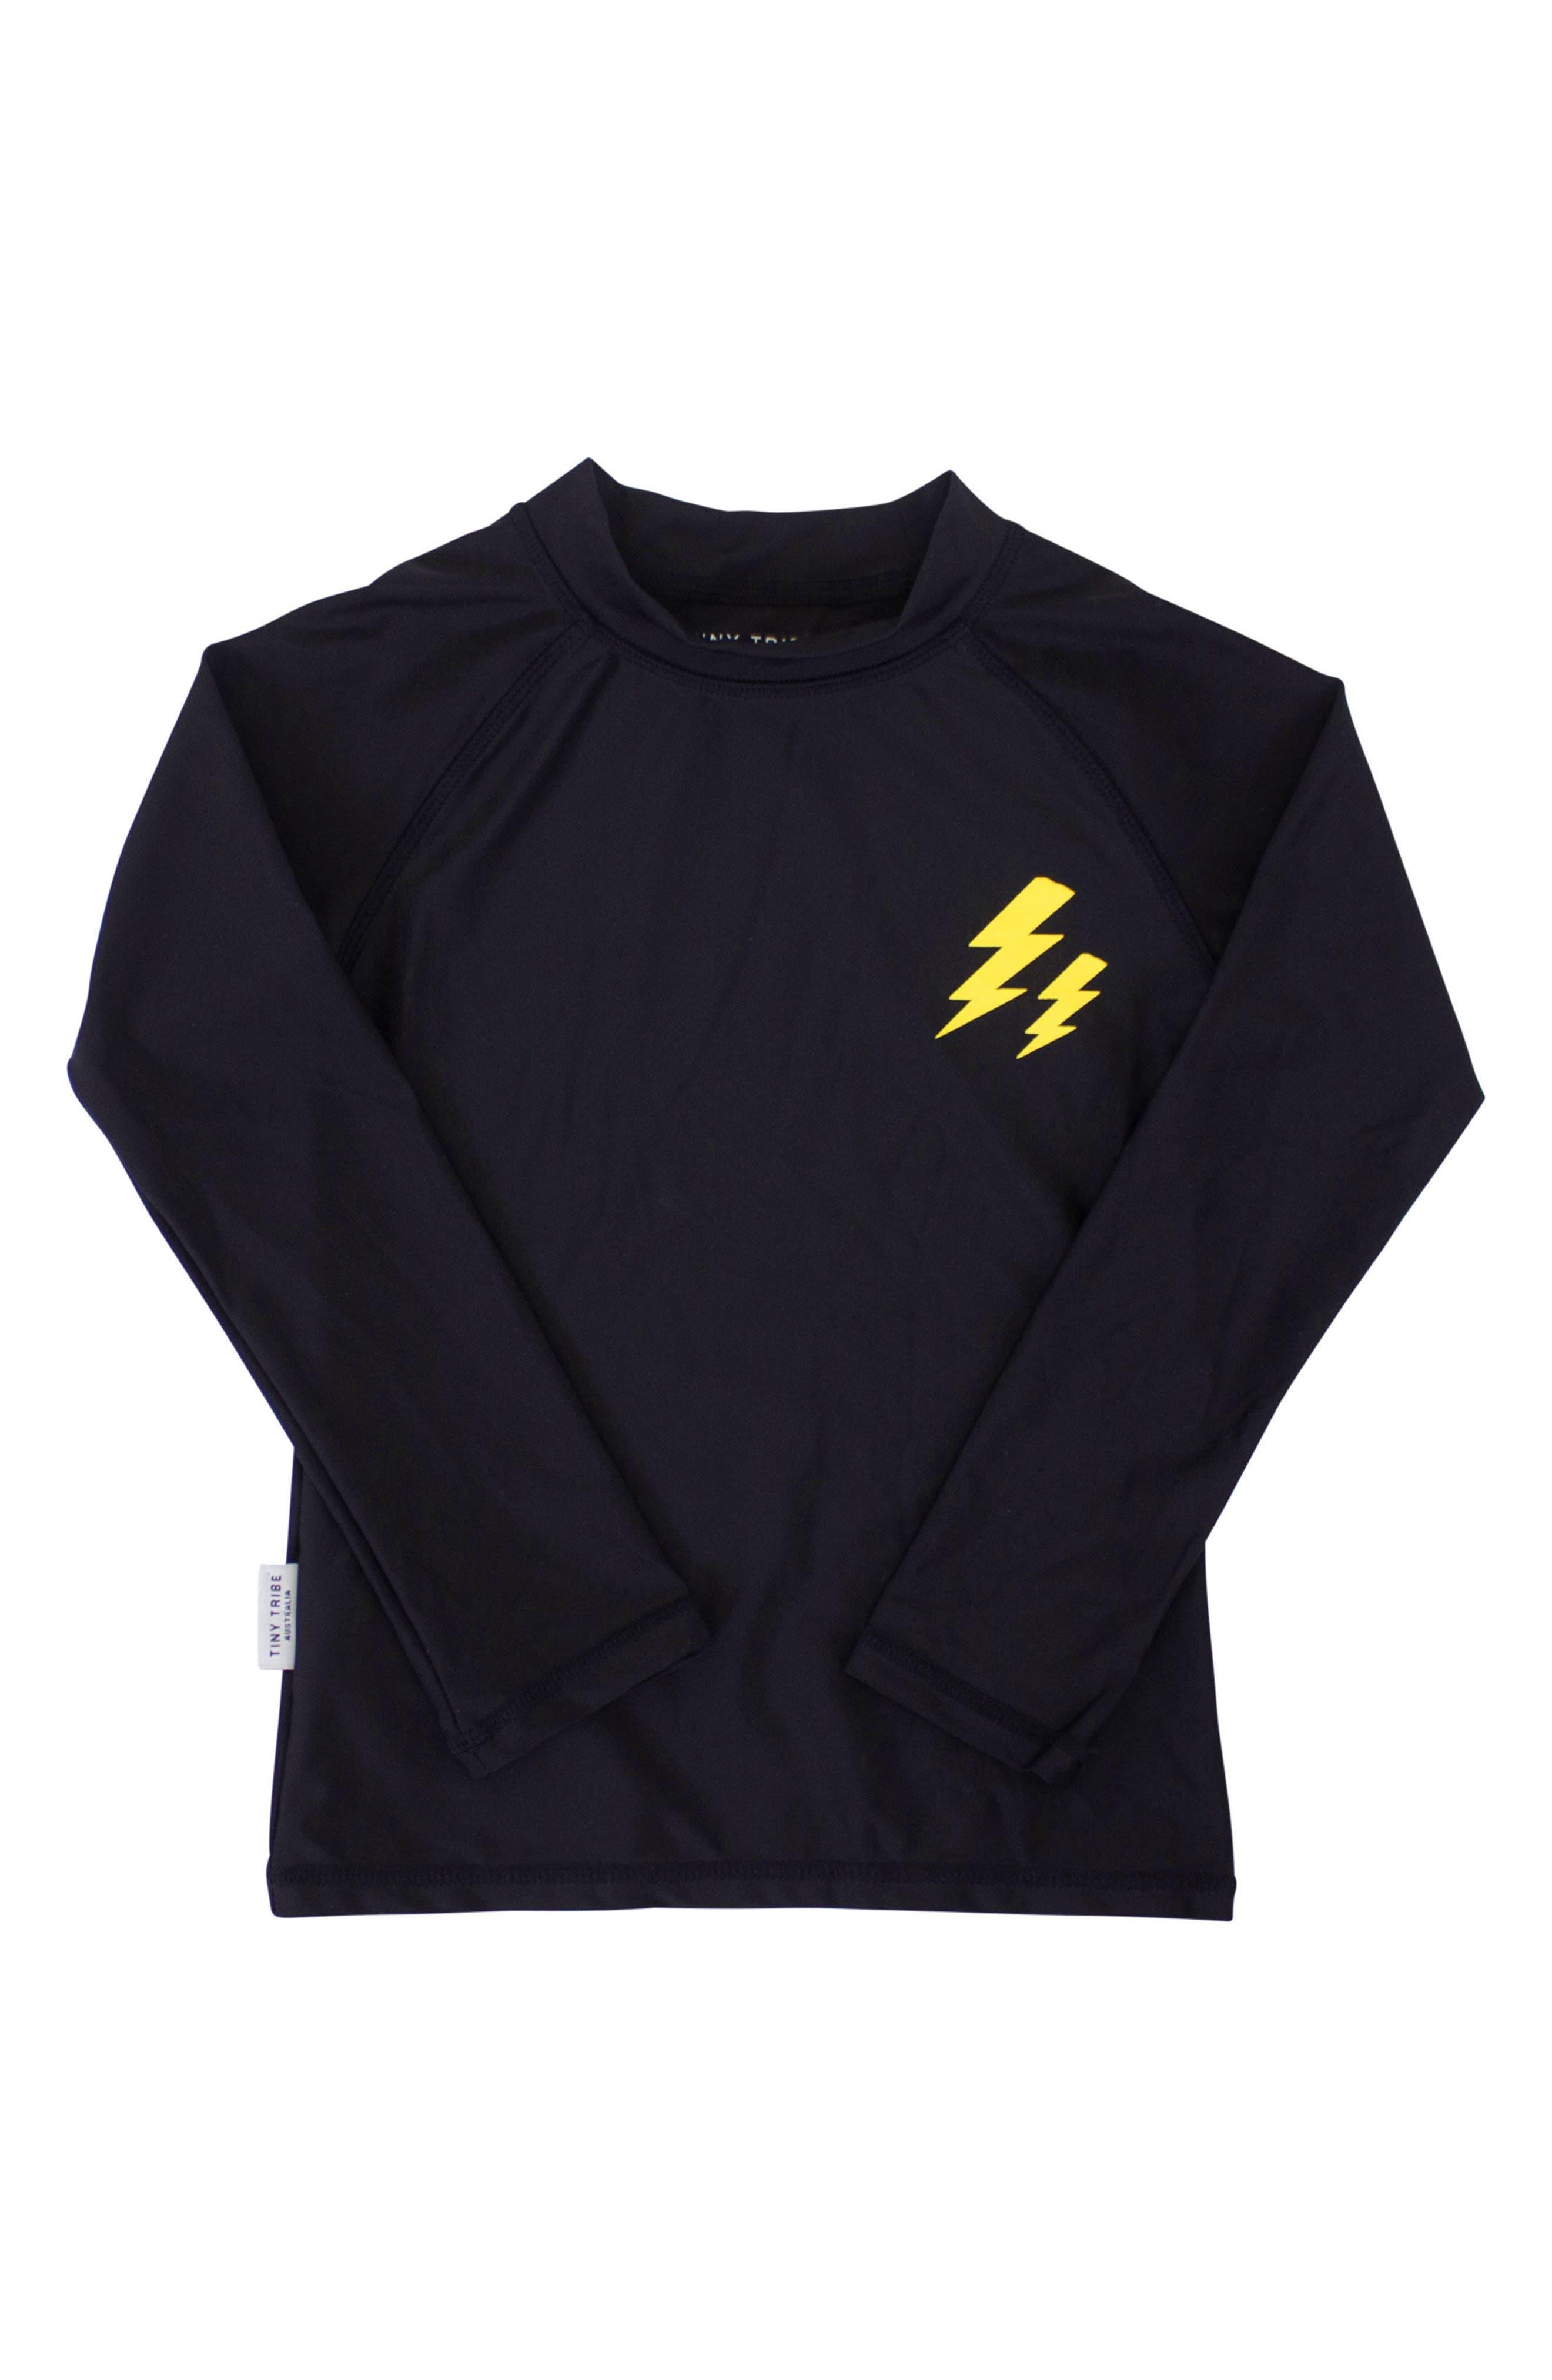 Electric Rashguard Top,                         Main,                         color, Black